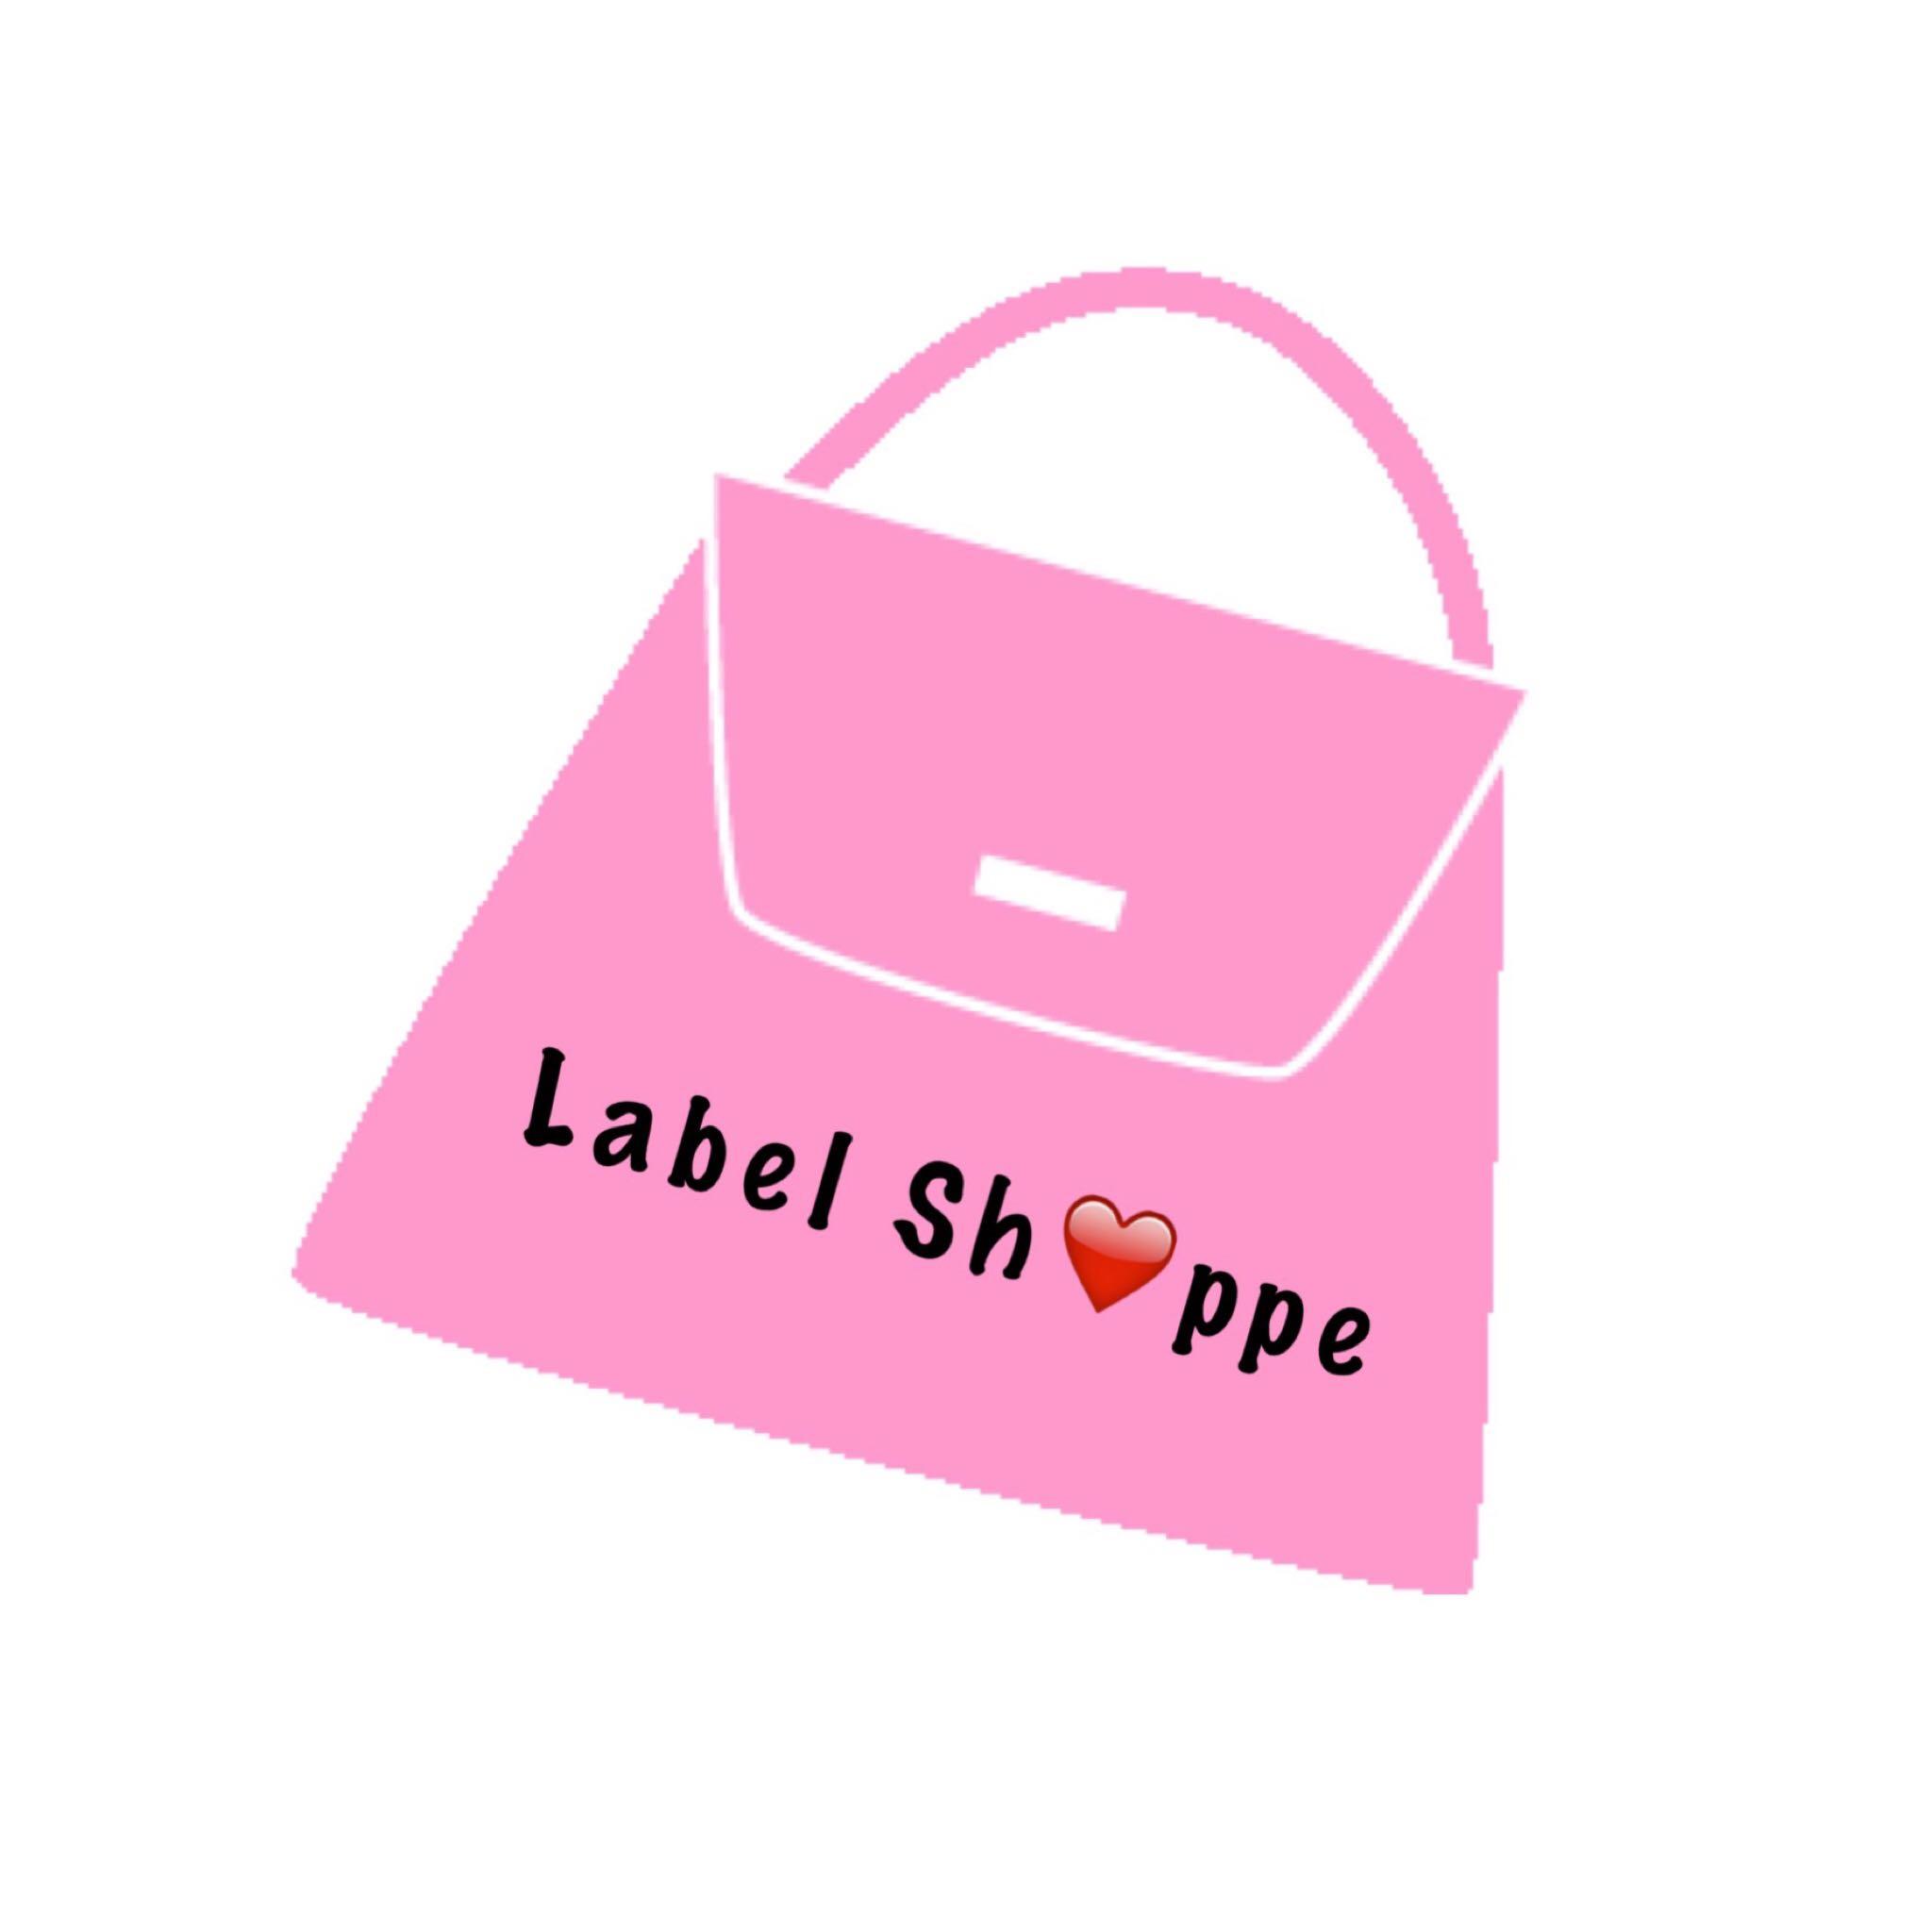 labelshoppemy